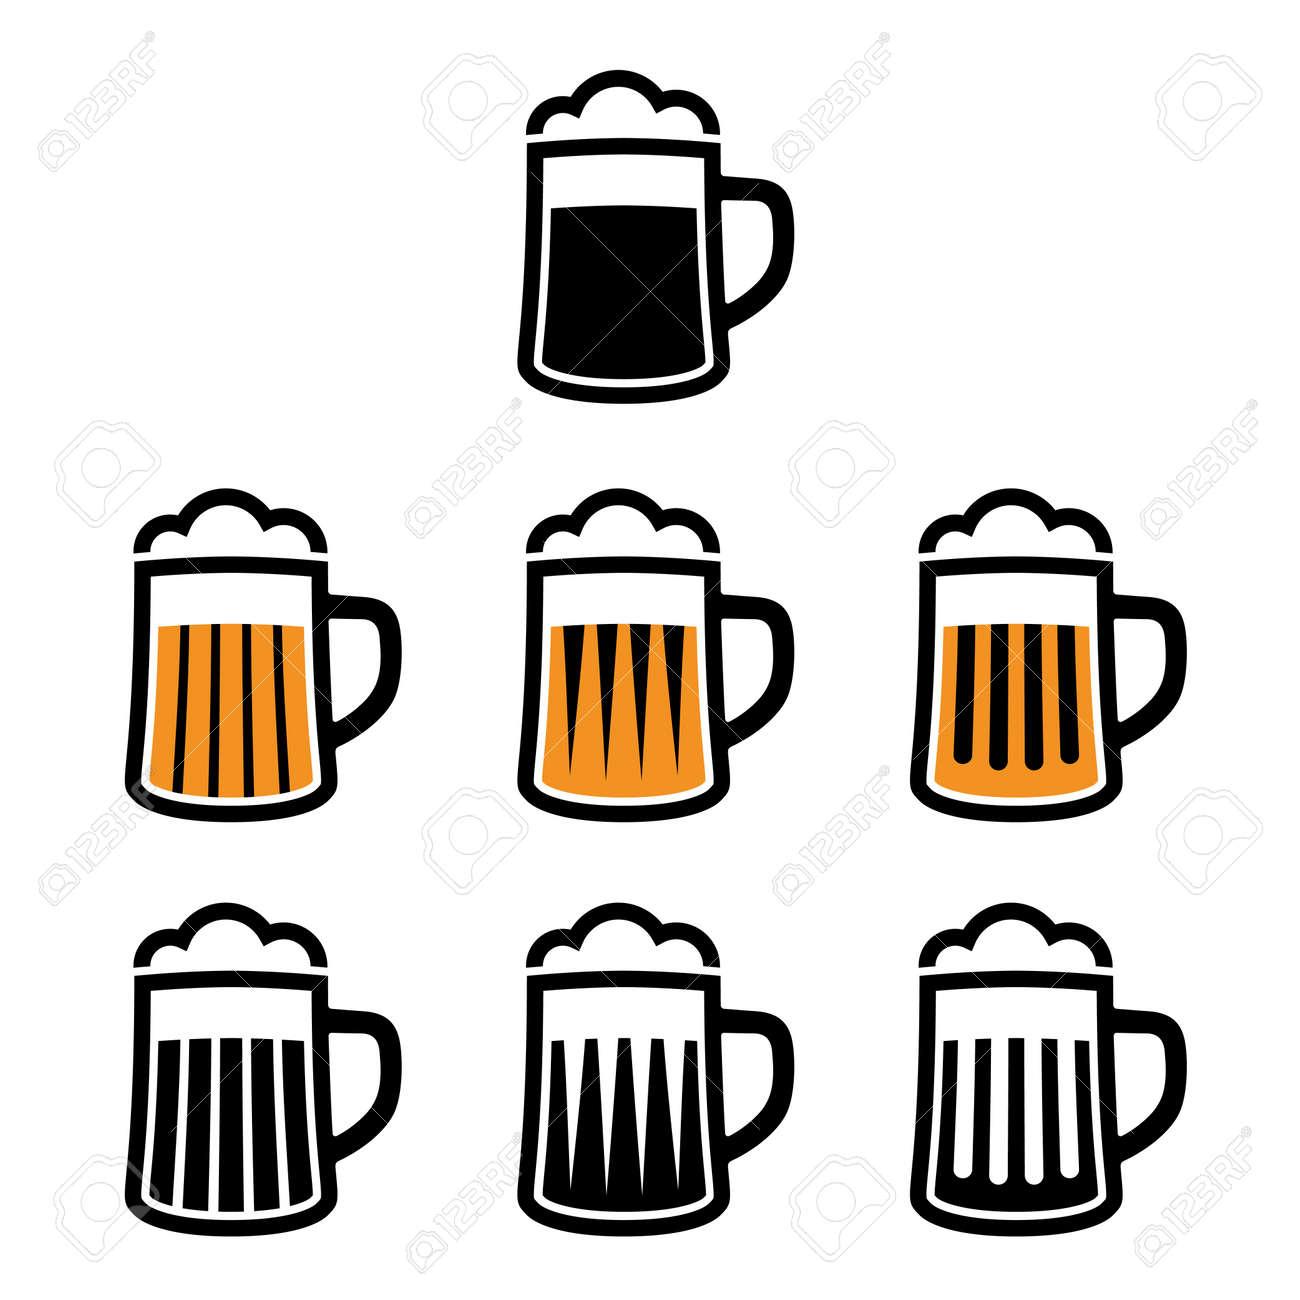 vector beer mug symbols royalty free cliparts vectors and stock rh 123rf com beer vector download beer vector mechanics solutions manual